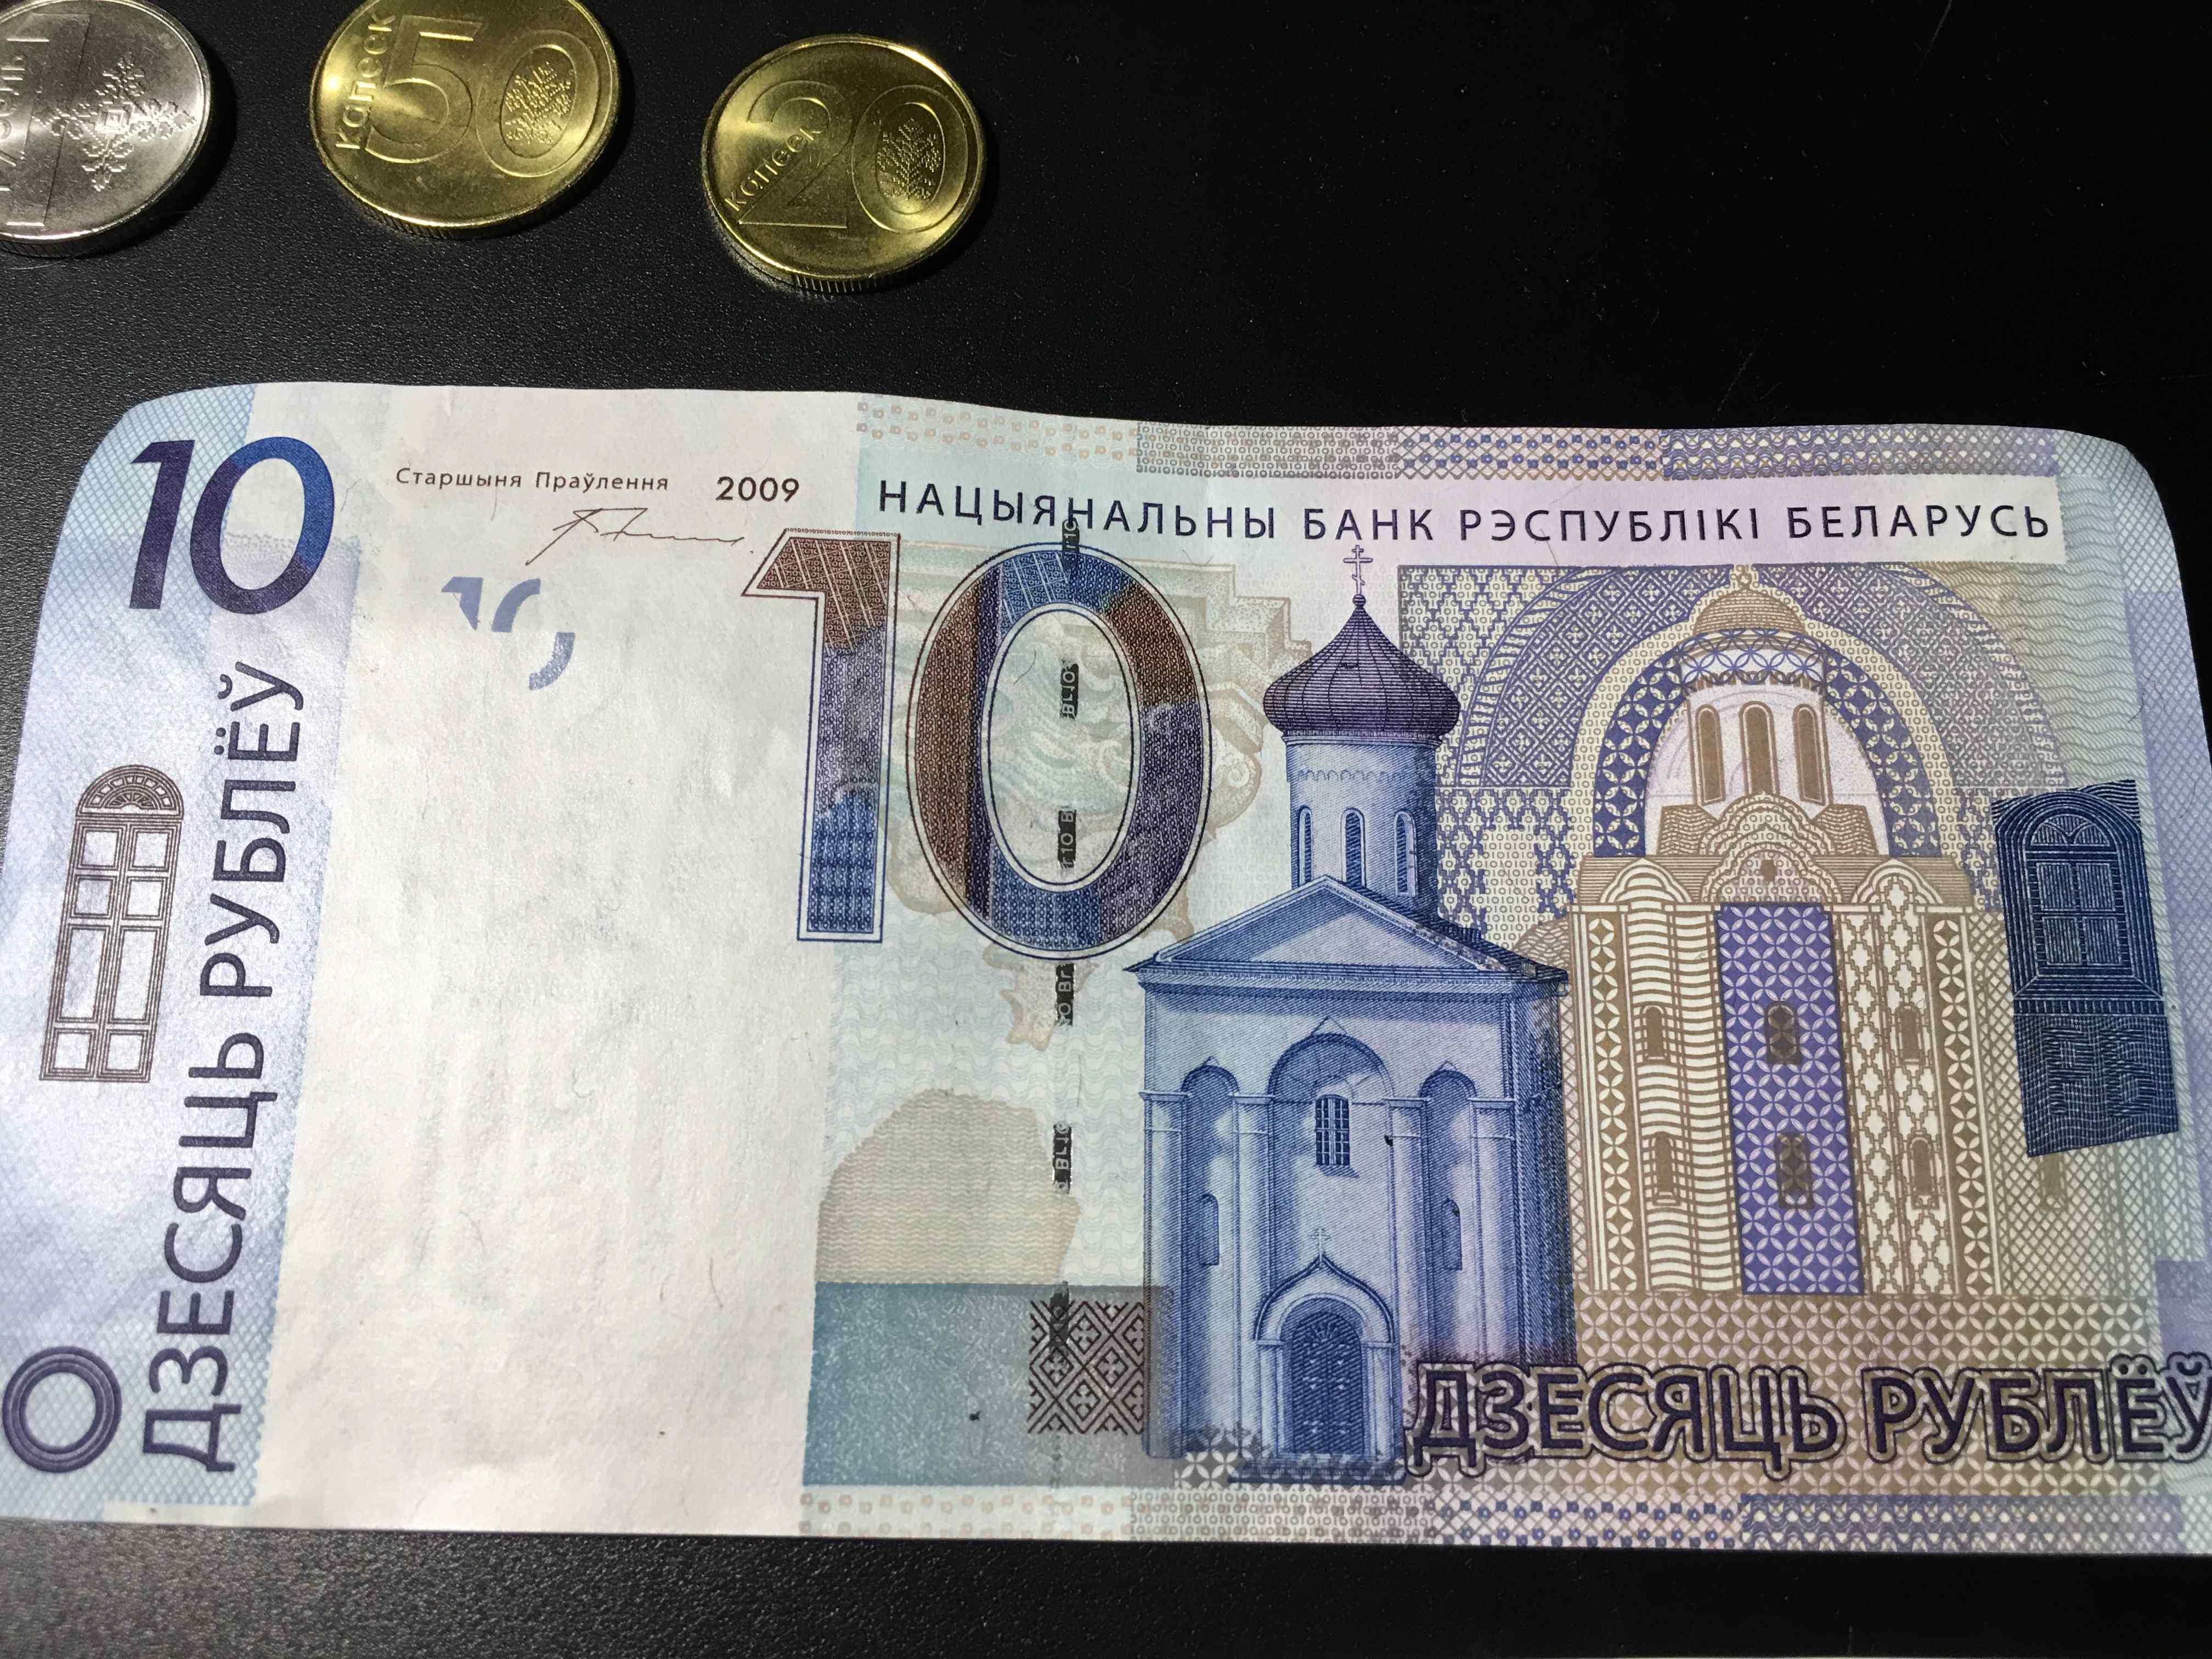 зданий белорусские рубли в рубли картинки постоянно